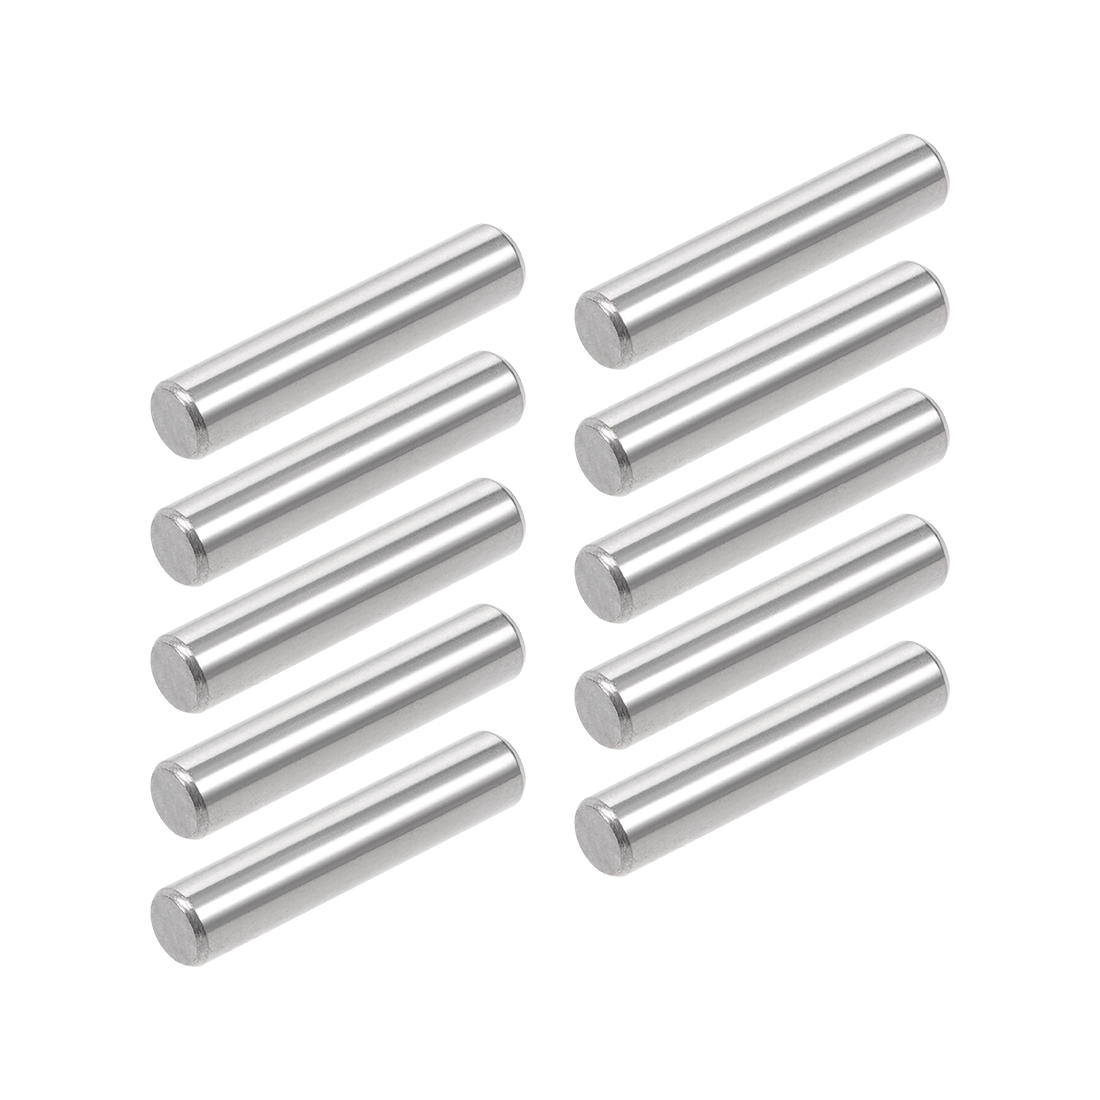 10Pcs 5mm x 60mm Dowel Pin 304 Stainless Steel Shelf Support Pin Fasten Elements